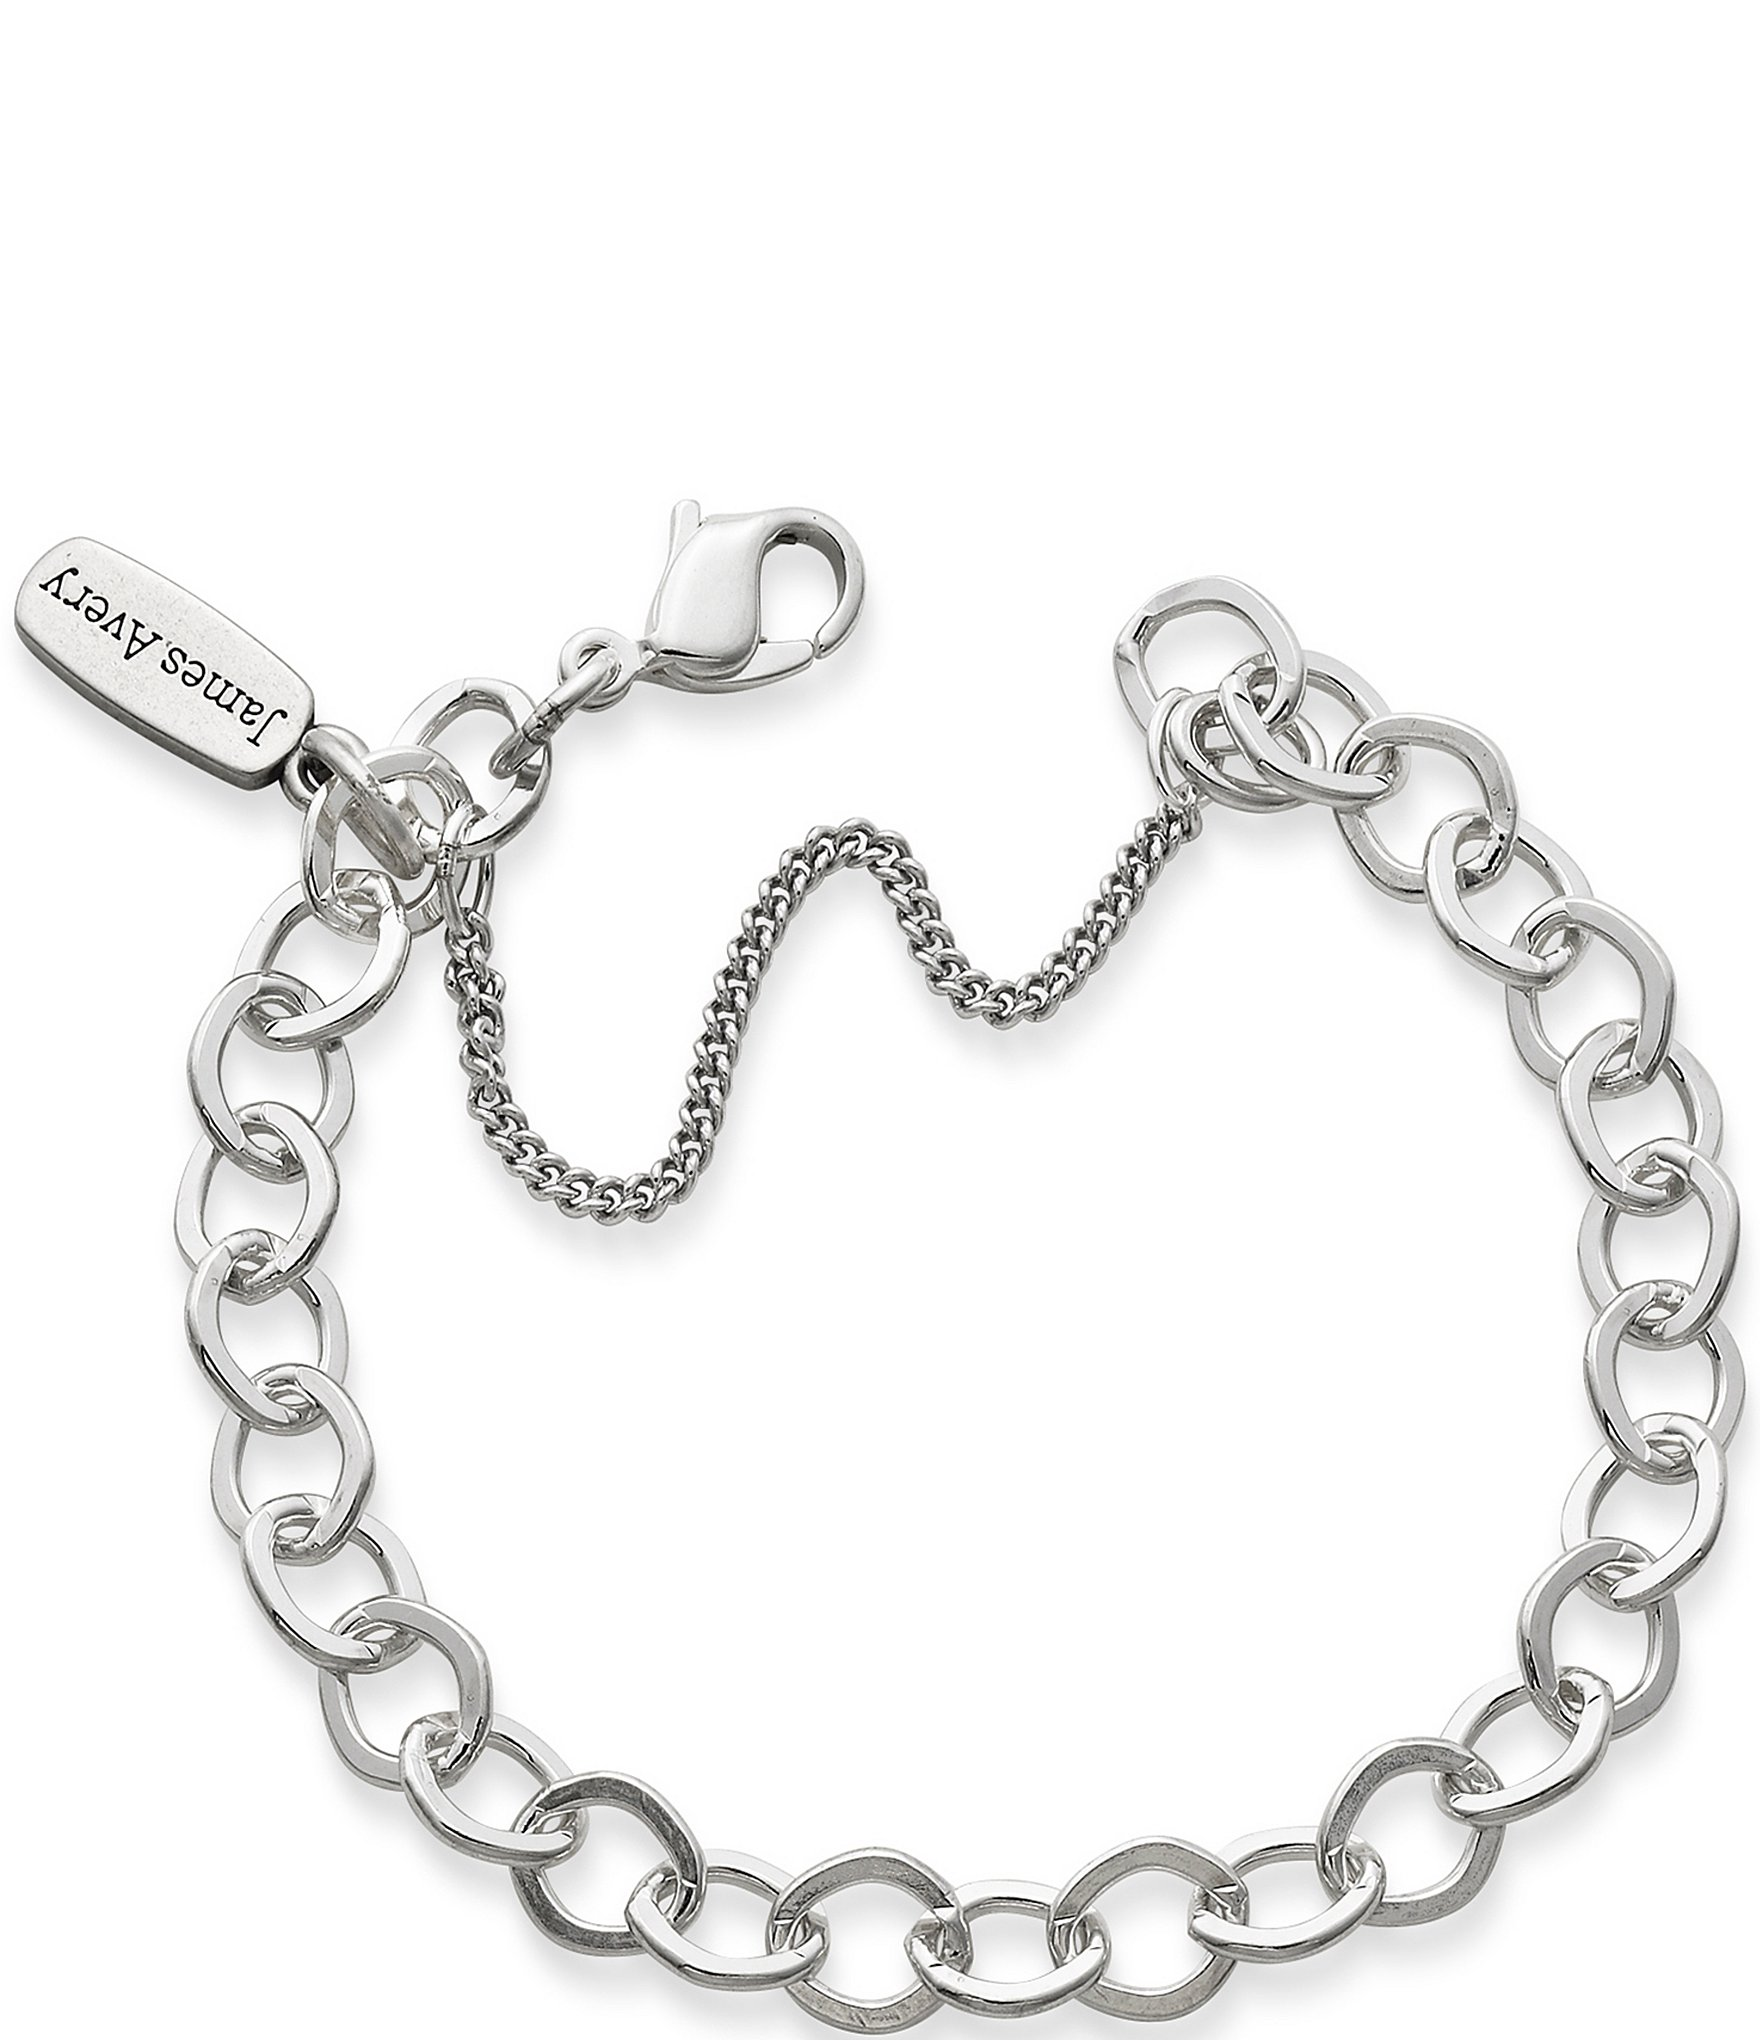 Pandora bracelet dillards - Pandora Bracelet Dillards 19